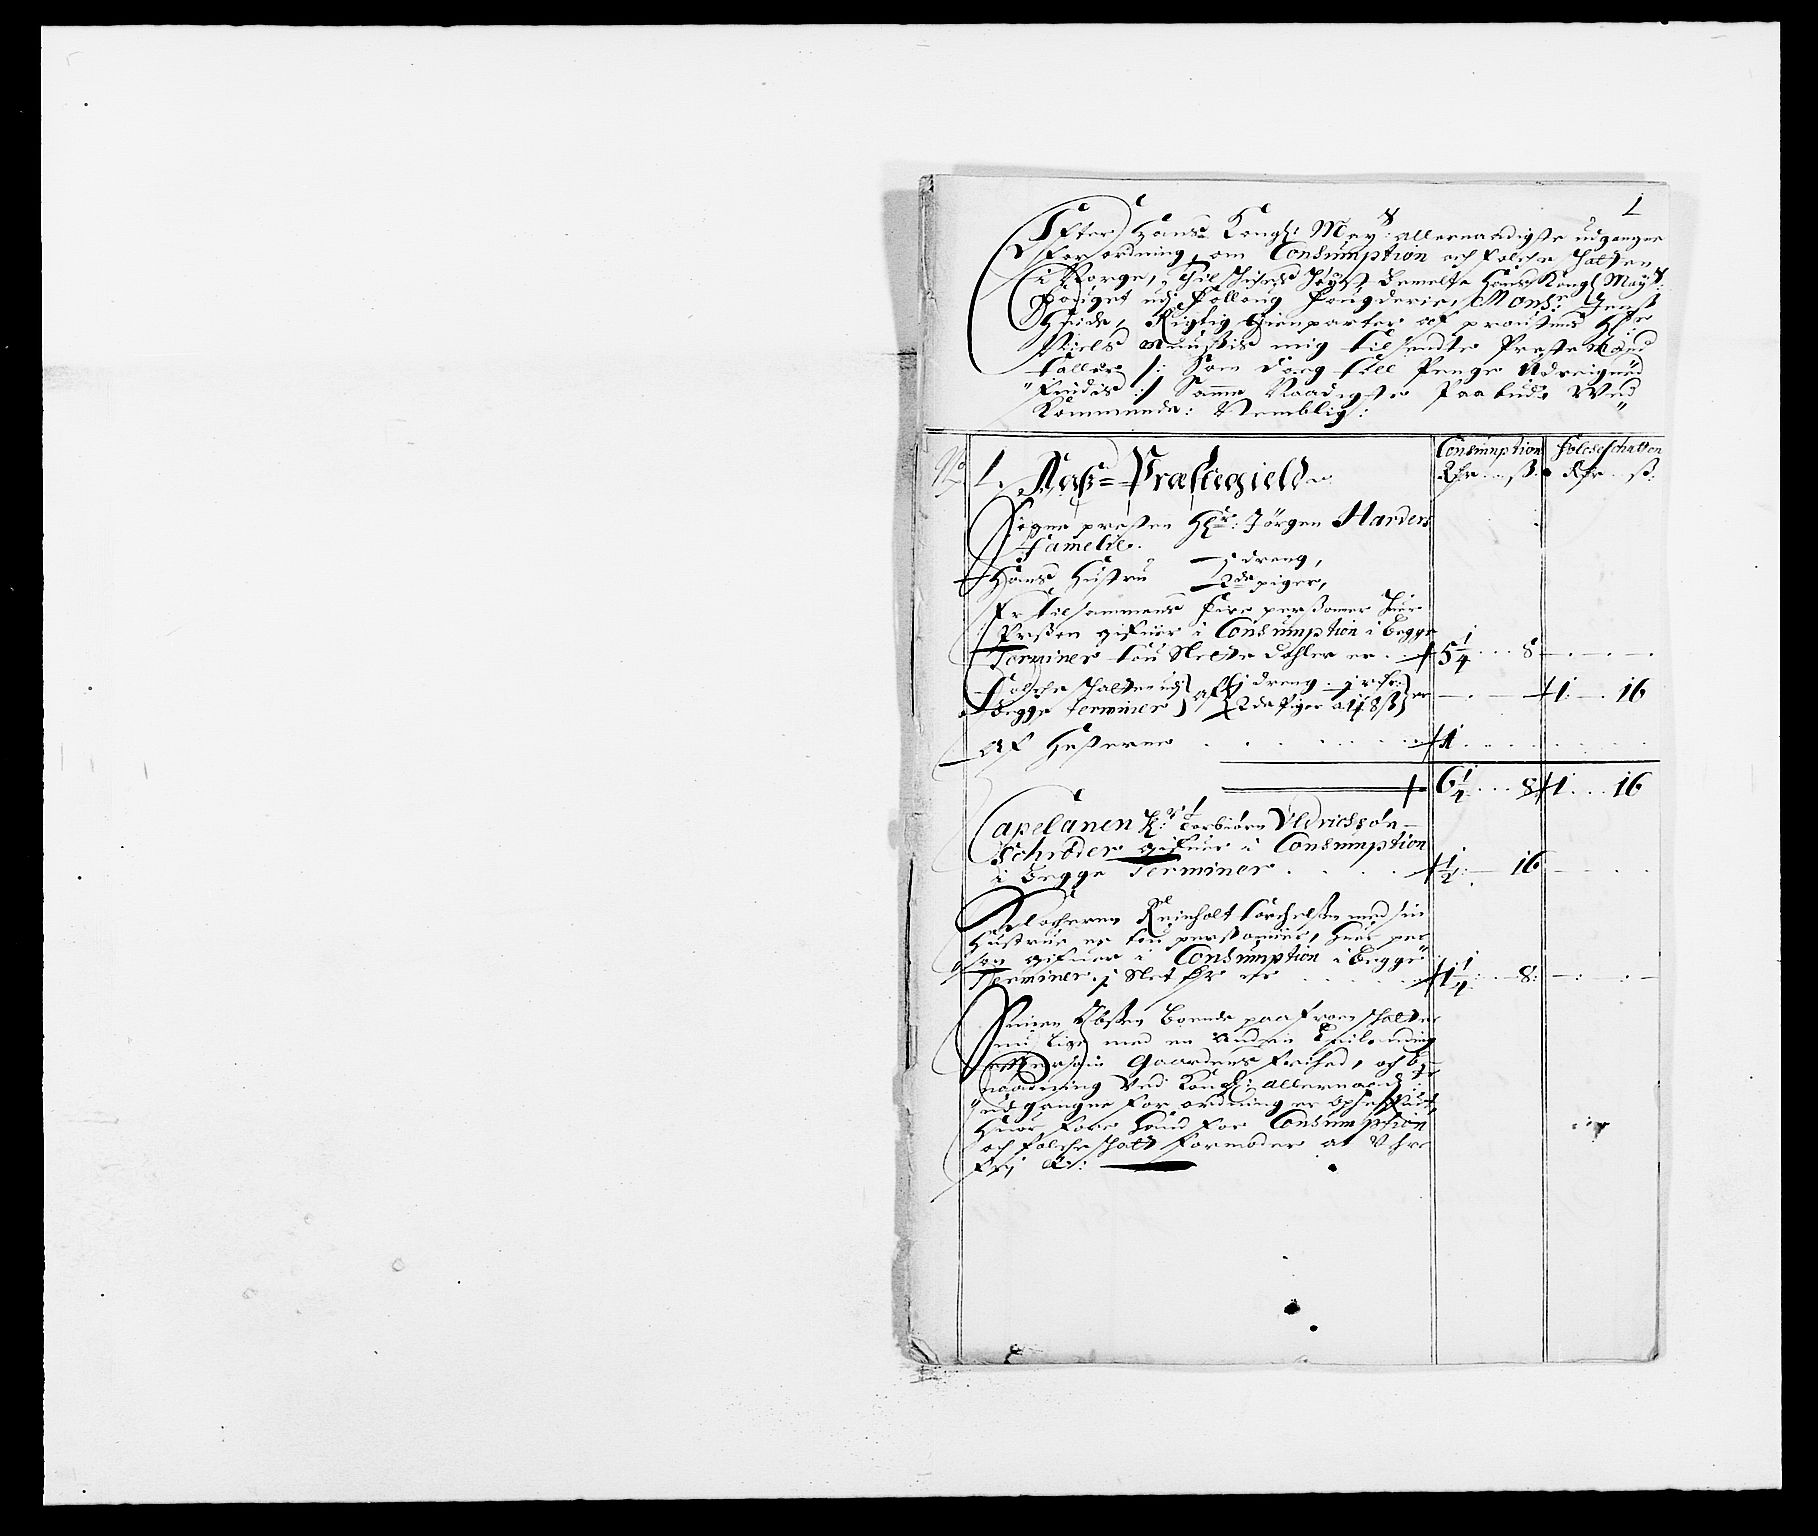 RA, Rentekammeret inntil 1814, Reviderte regnskaper, Fogderegnskap, R09/L0429: Fogderegnskap Follo, 1680-1681, s. 162